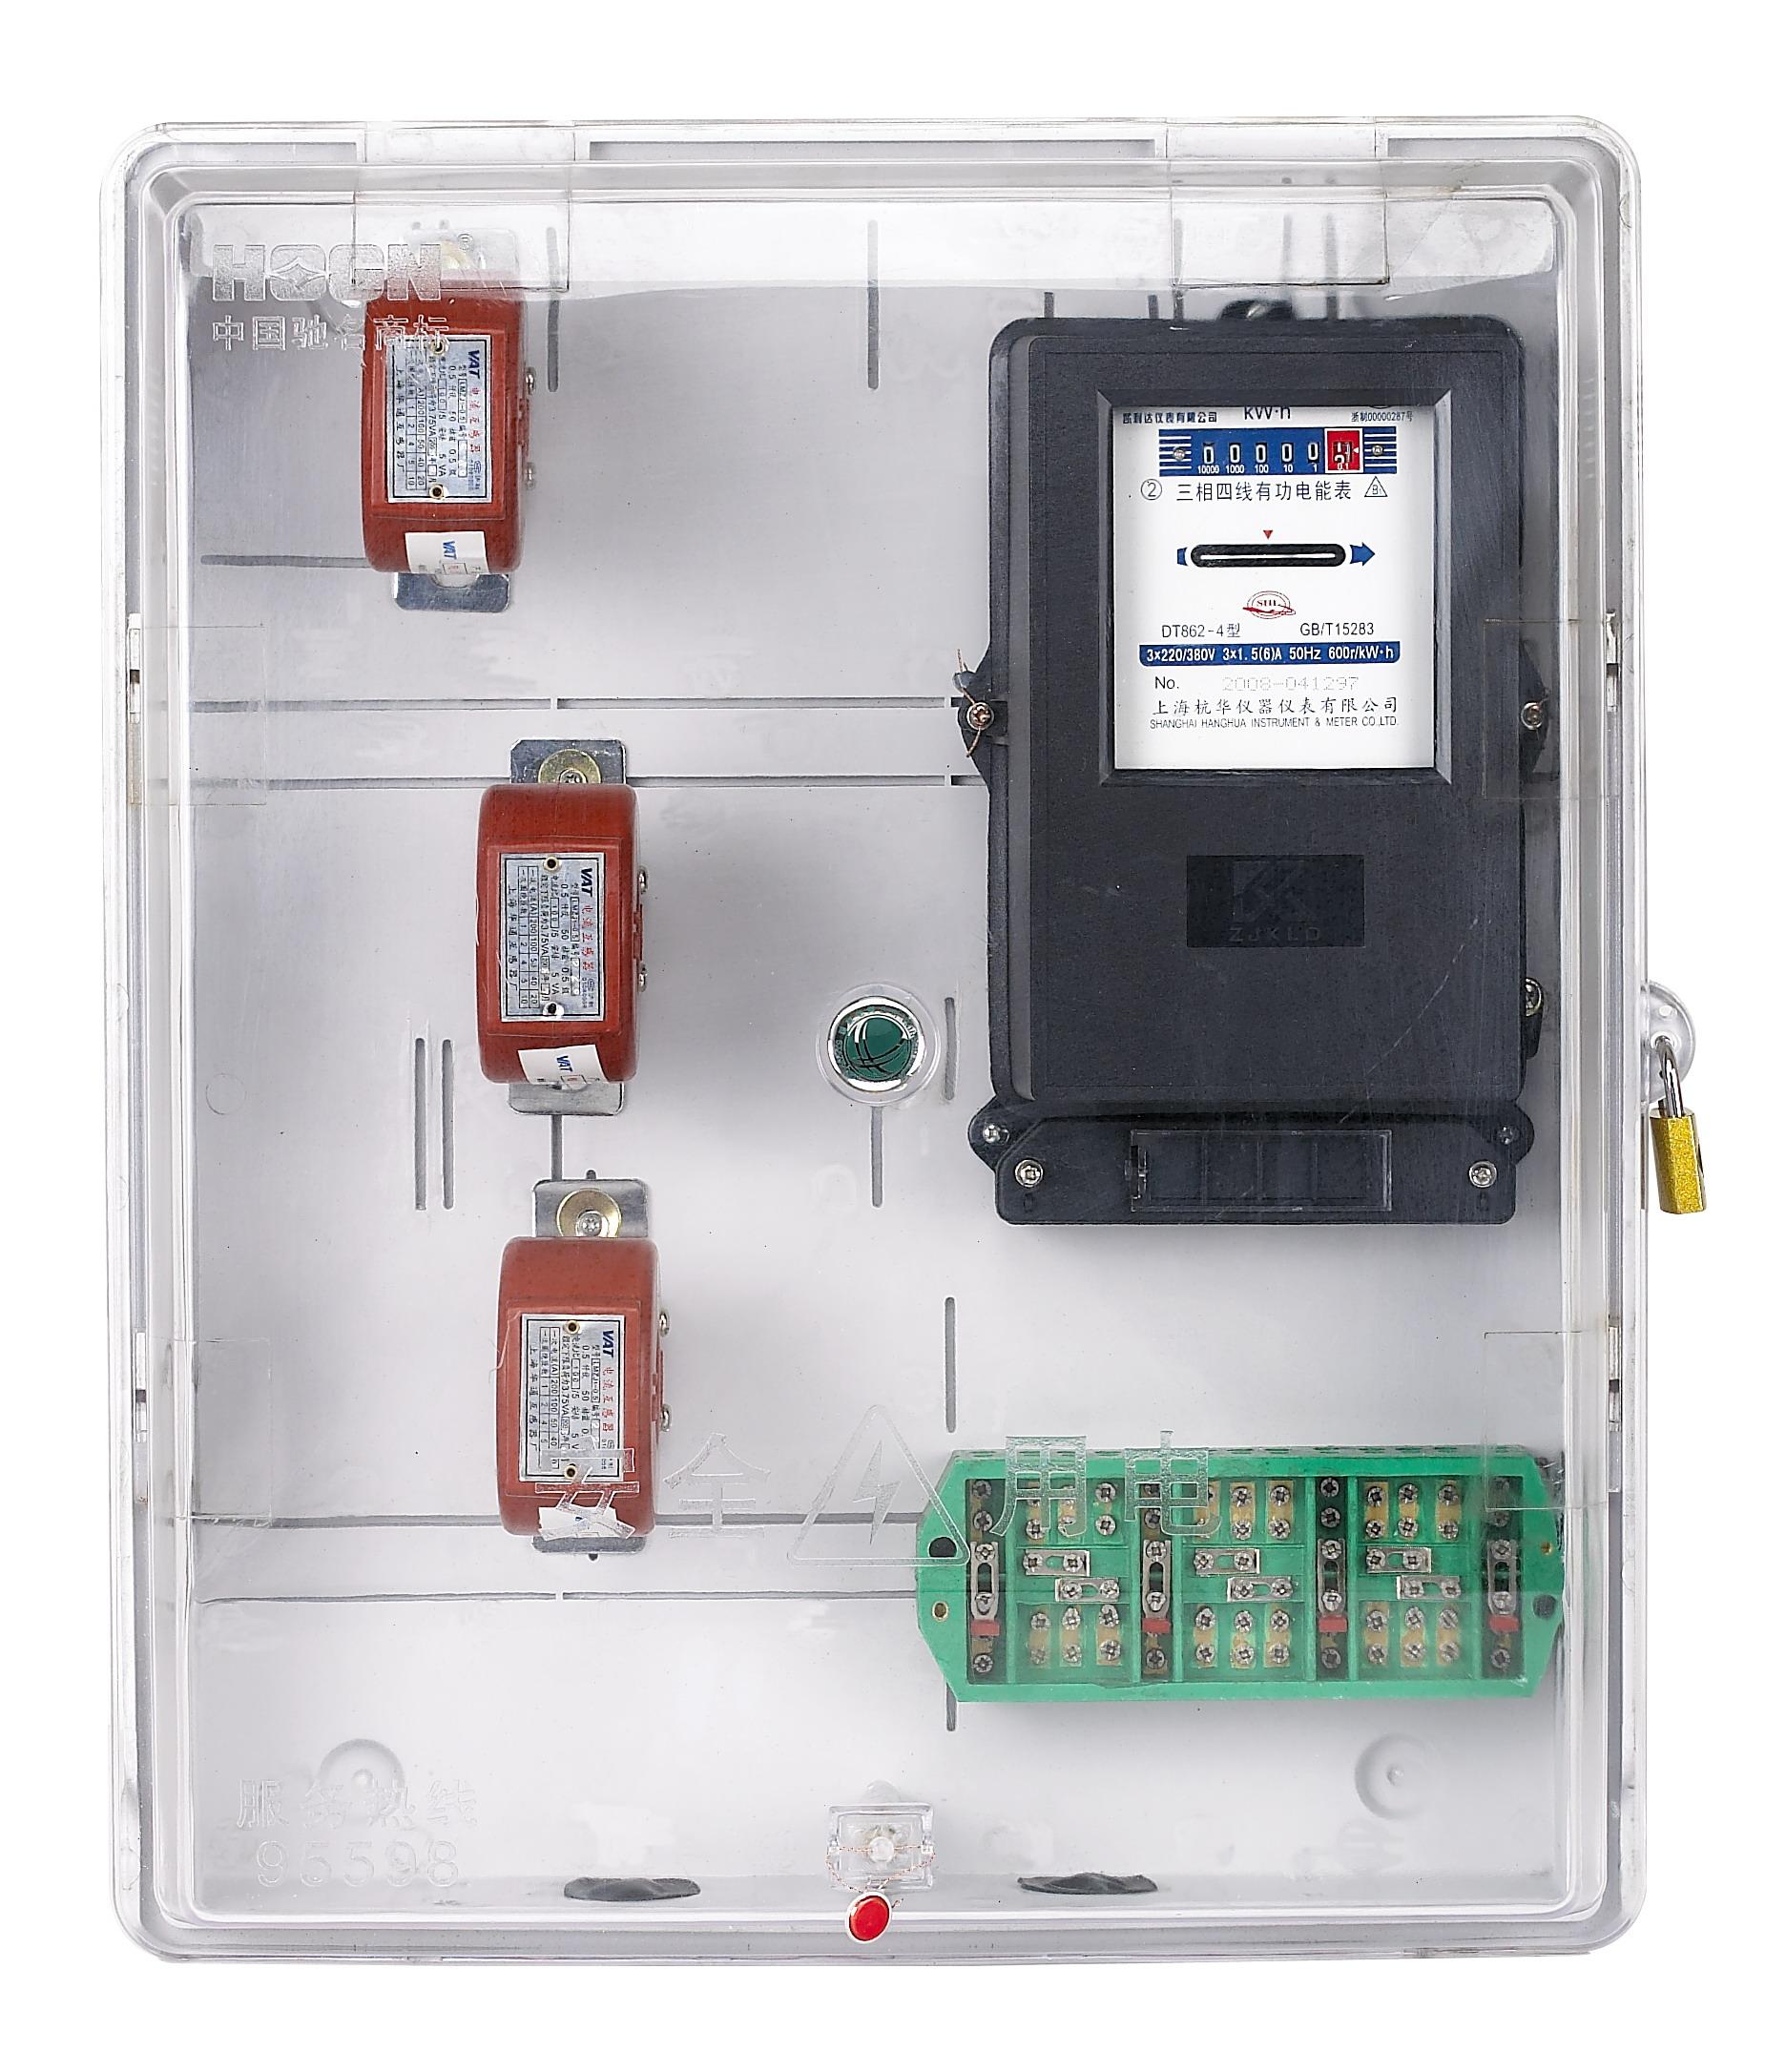 CT式全透明电表箱,防窃型电表箱,玻璃钢电表箱, 外形尺寸:520mm×570mm×142mm 功能特点:全透明一体式设计,美观大方,内可配置进、出线端子排,大功率的二、三级漏保、断路器、联合接线盒、互感器等空间,设计流畅给人一种艺术美感。内可放电子表、机械表(高盖型)、可根据客户要求开设IC卡窗口,控制开关窗口等。 电力聚碳酸酯透明电表箱采用整体一次注塑成型技术,填补了高端电表箱的国内空白。该产品采用新型环保工程塑料PC及PC/ABS合成材料制造,产品具有优良的透明性、电绝缘性、